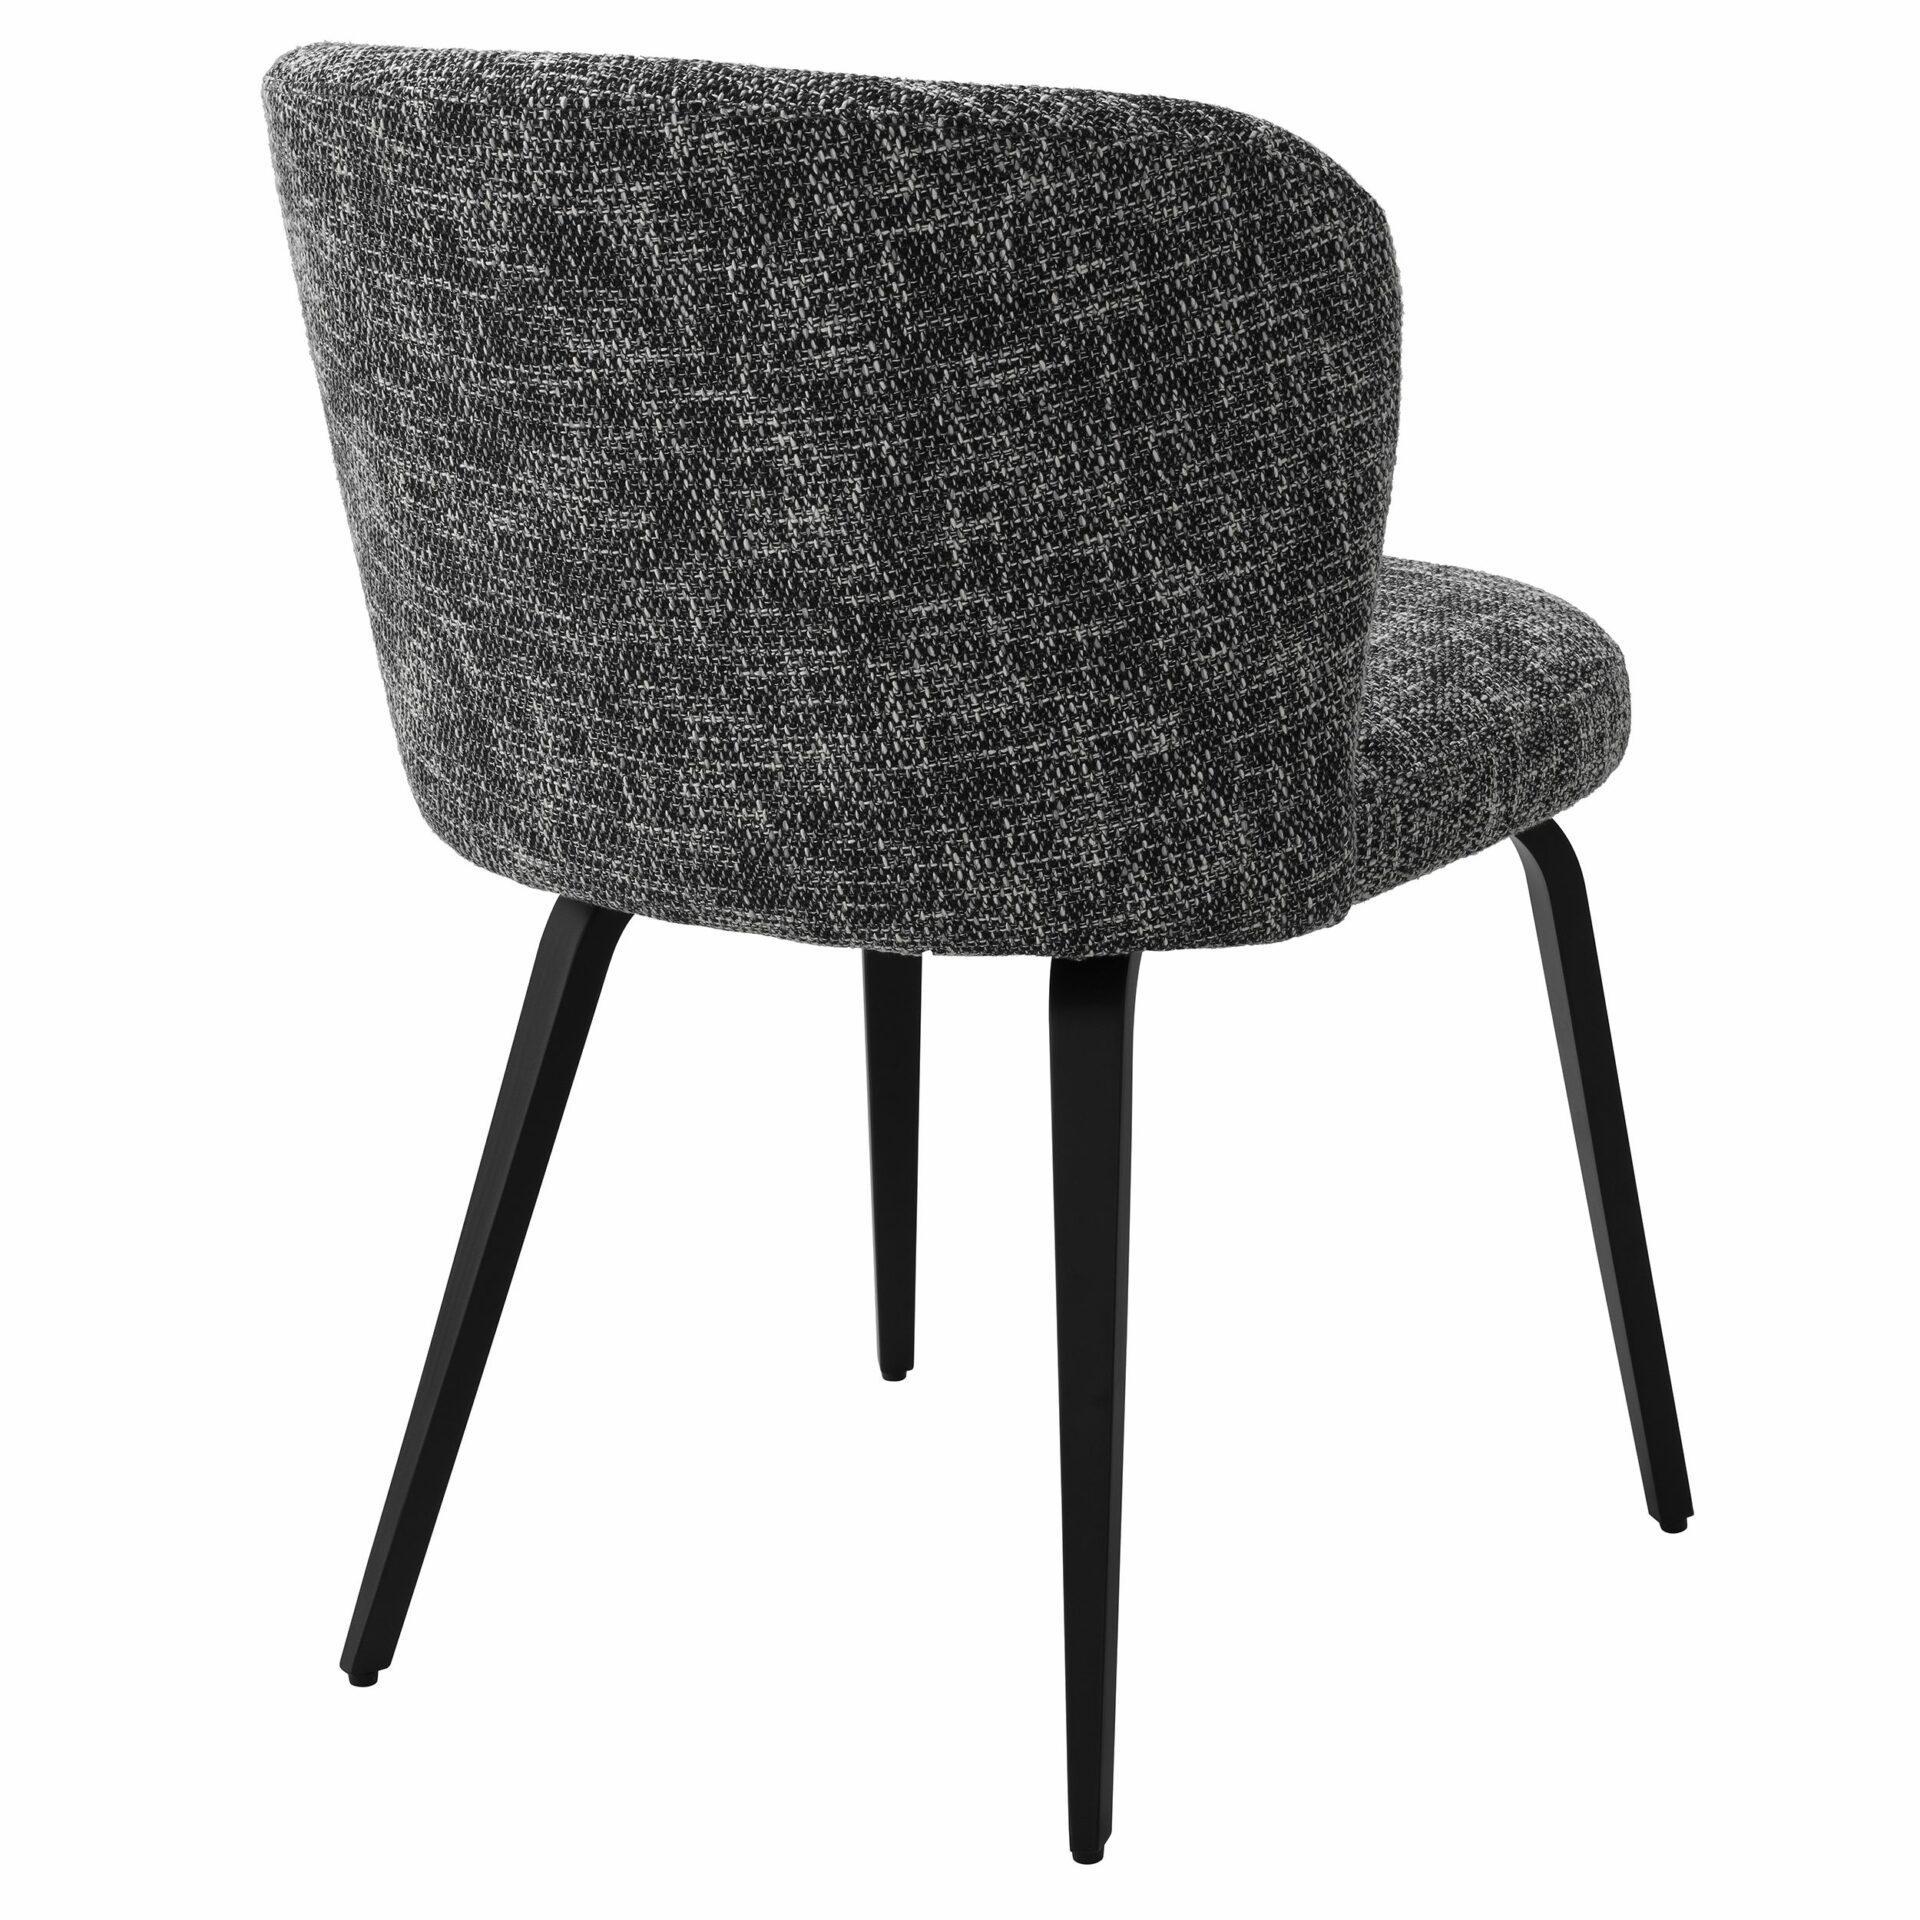 Eichholtz-chair-harald-2